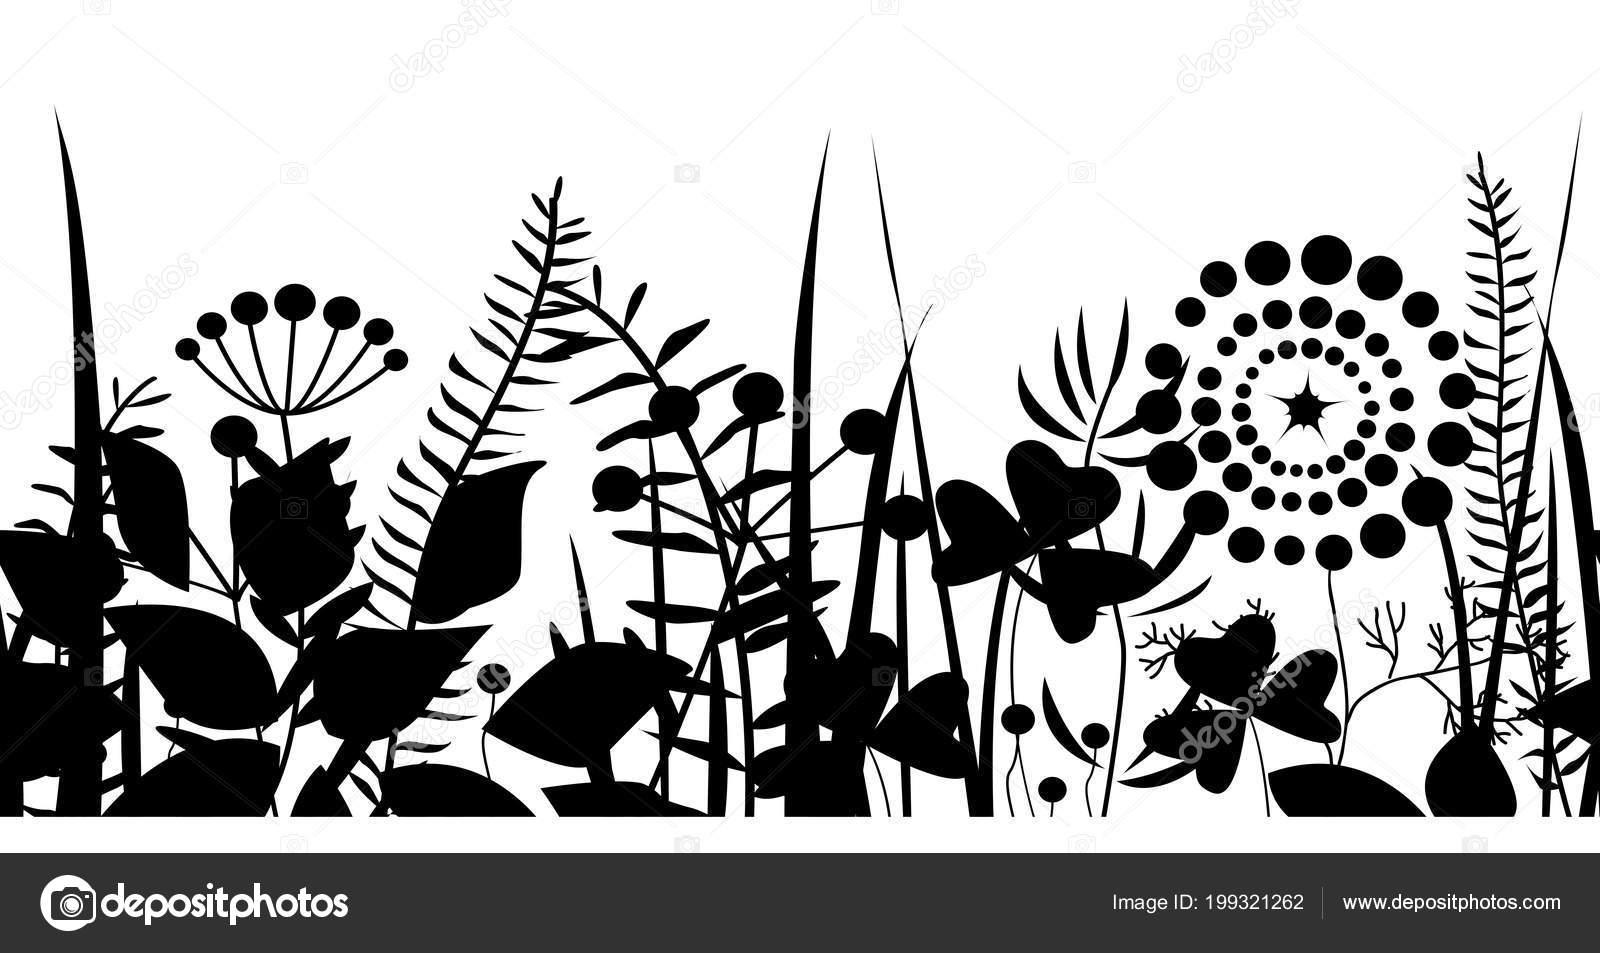 spring black grass silhouette seamless background vector pattern eco nature stock vector c toltemara 199321262 depositphotos